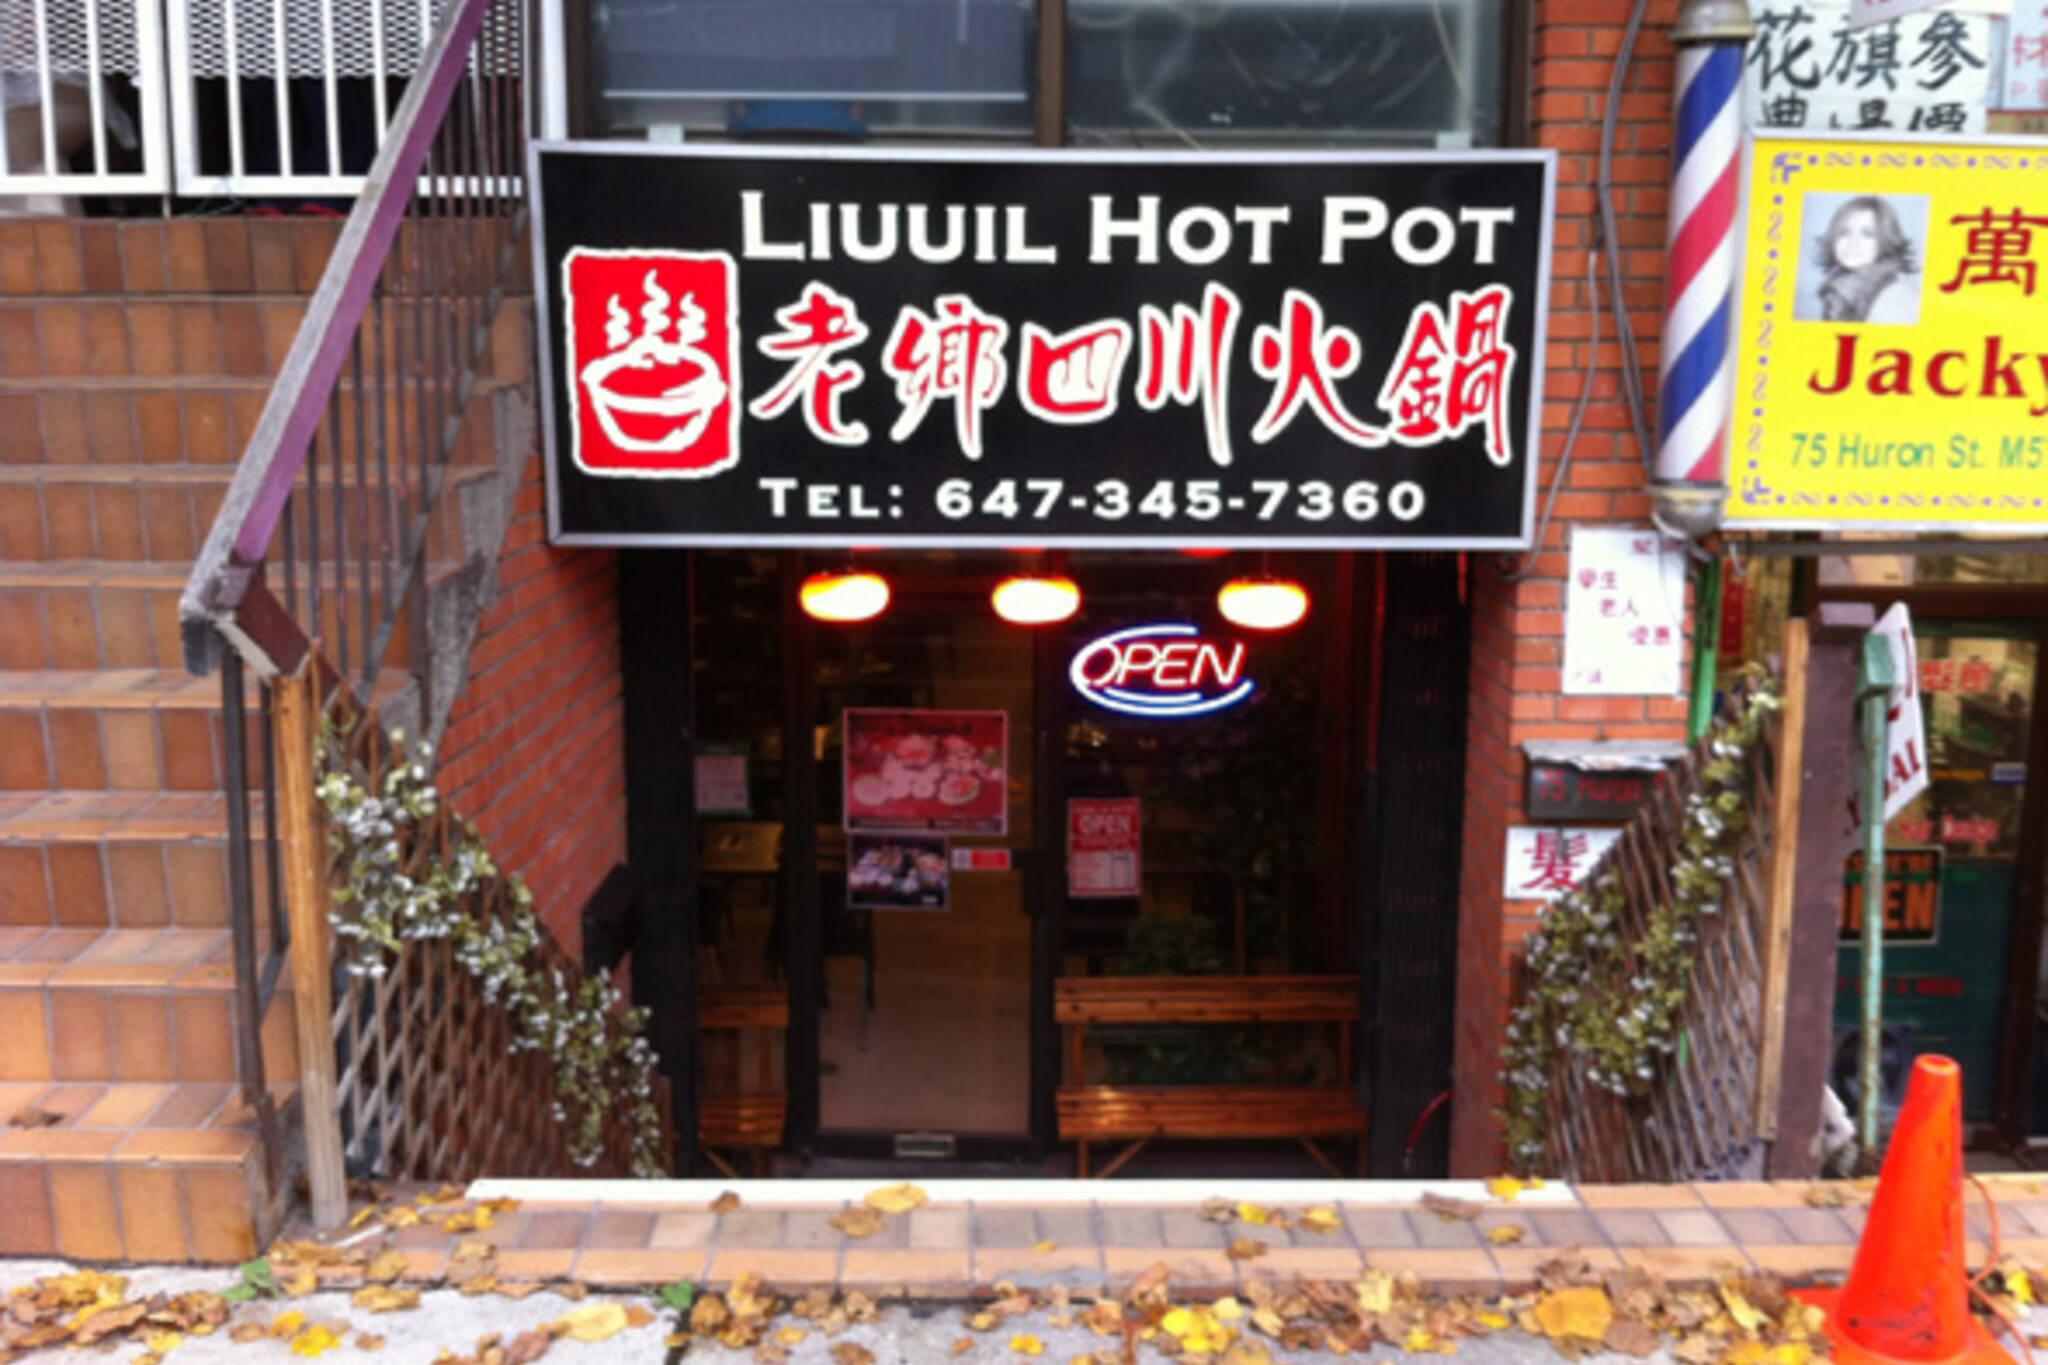 Liuuil Hot Pot